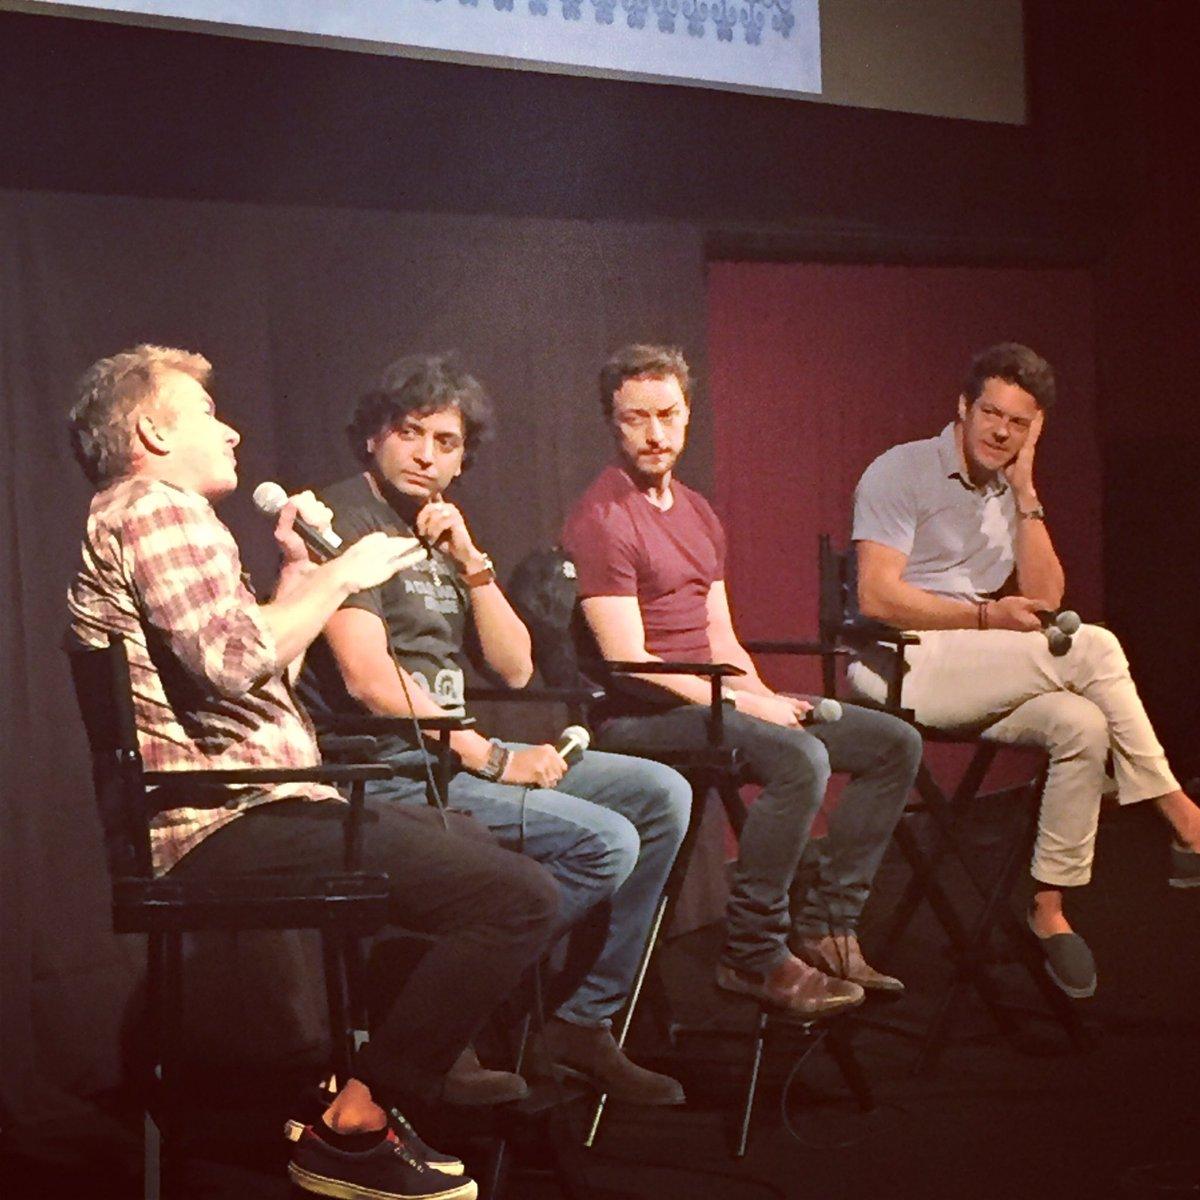 Tim League, M. Night Shyamalan, James McAvoy and Jason Blum: tonight's #FantasticFest secret screening was SPLIT. https://t.co/ikFfsIA4ik